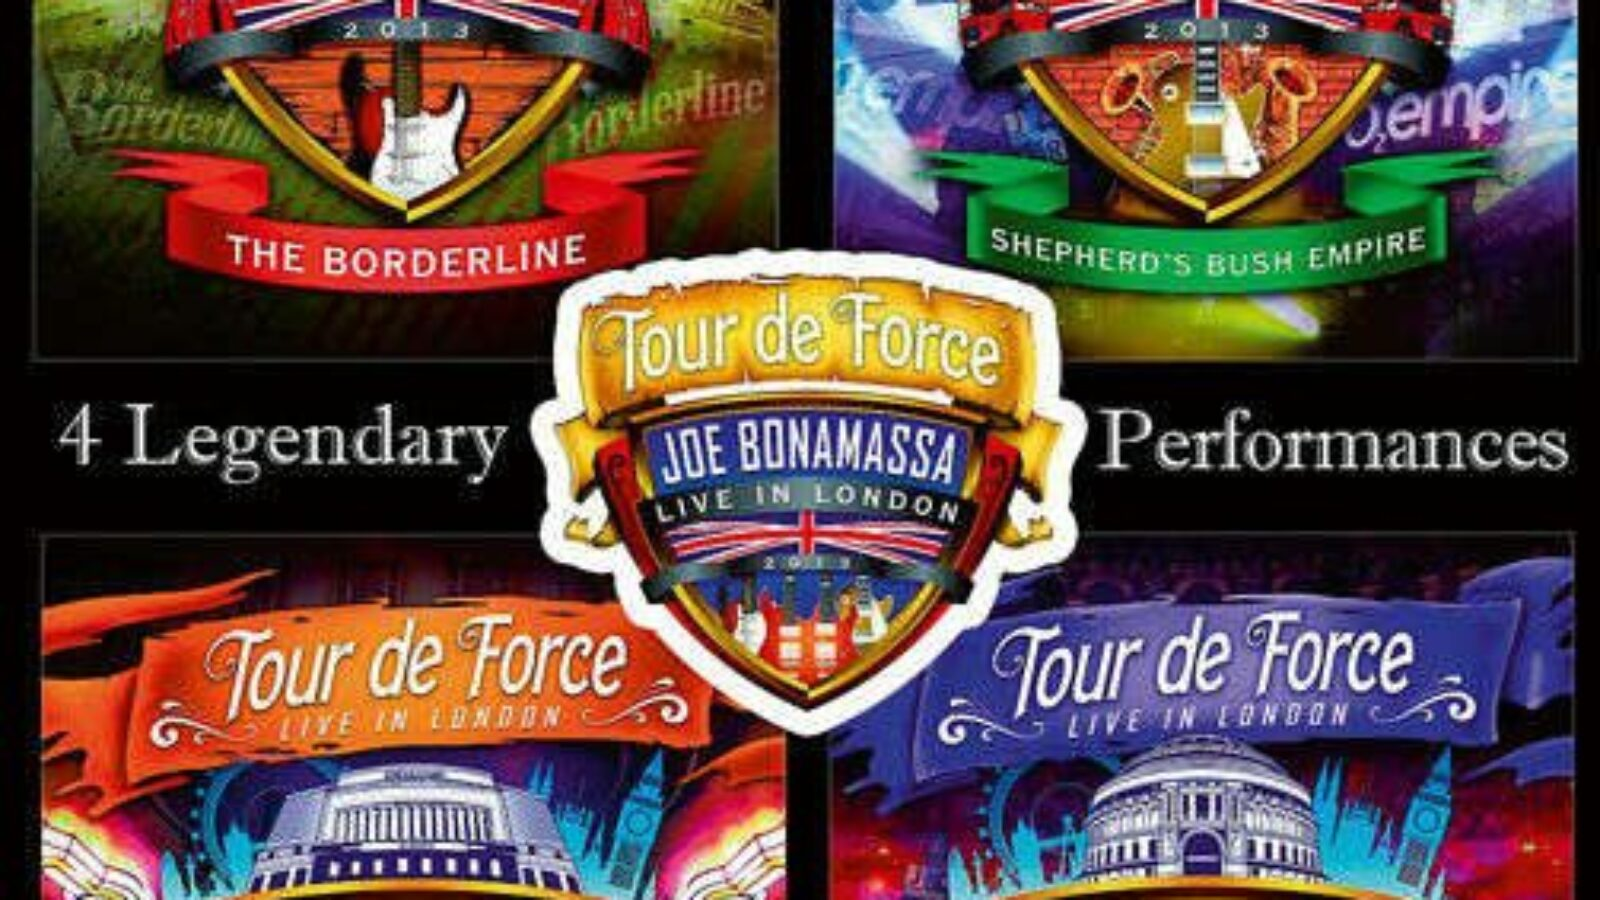 JOE BONAMASSA – Tour De Force (DVD/Blu-ray)